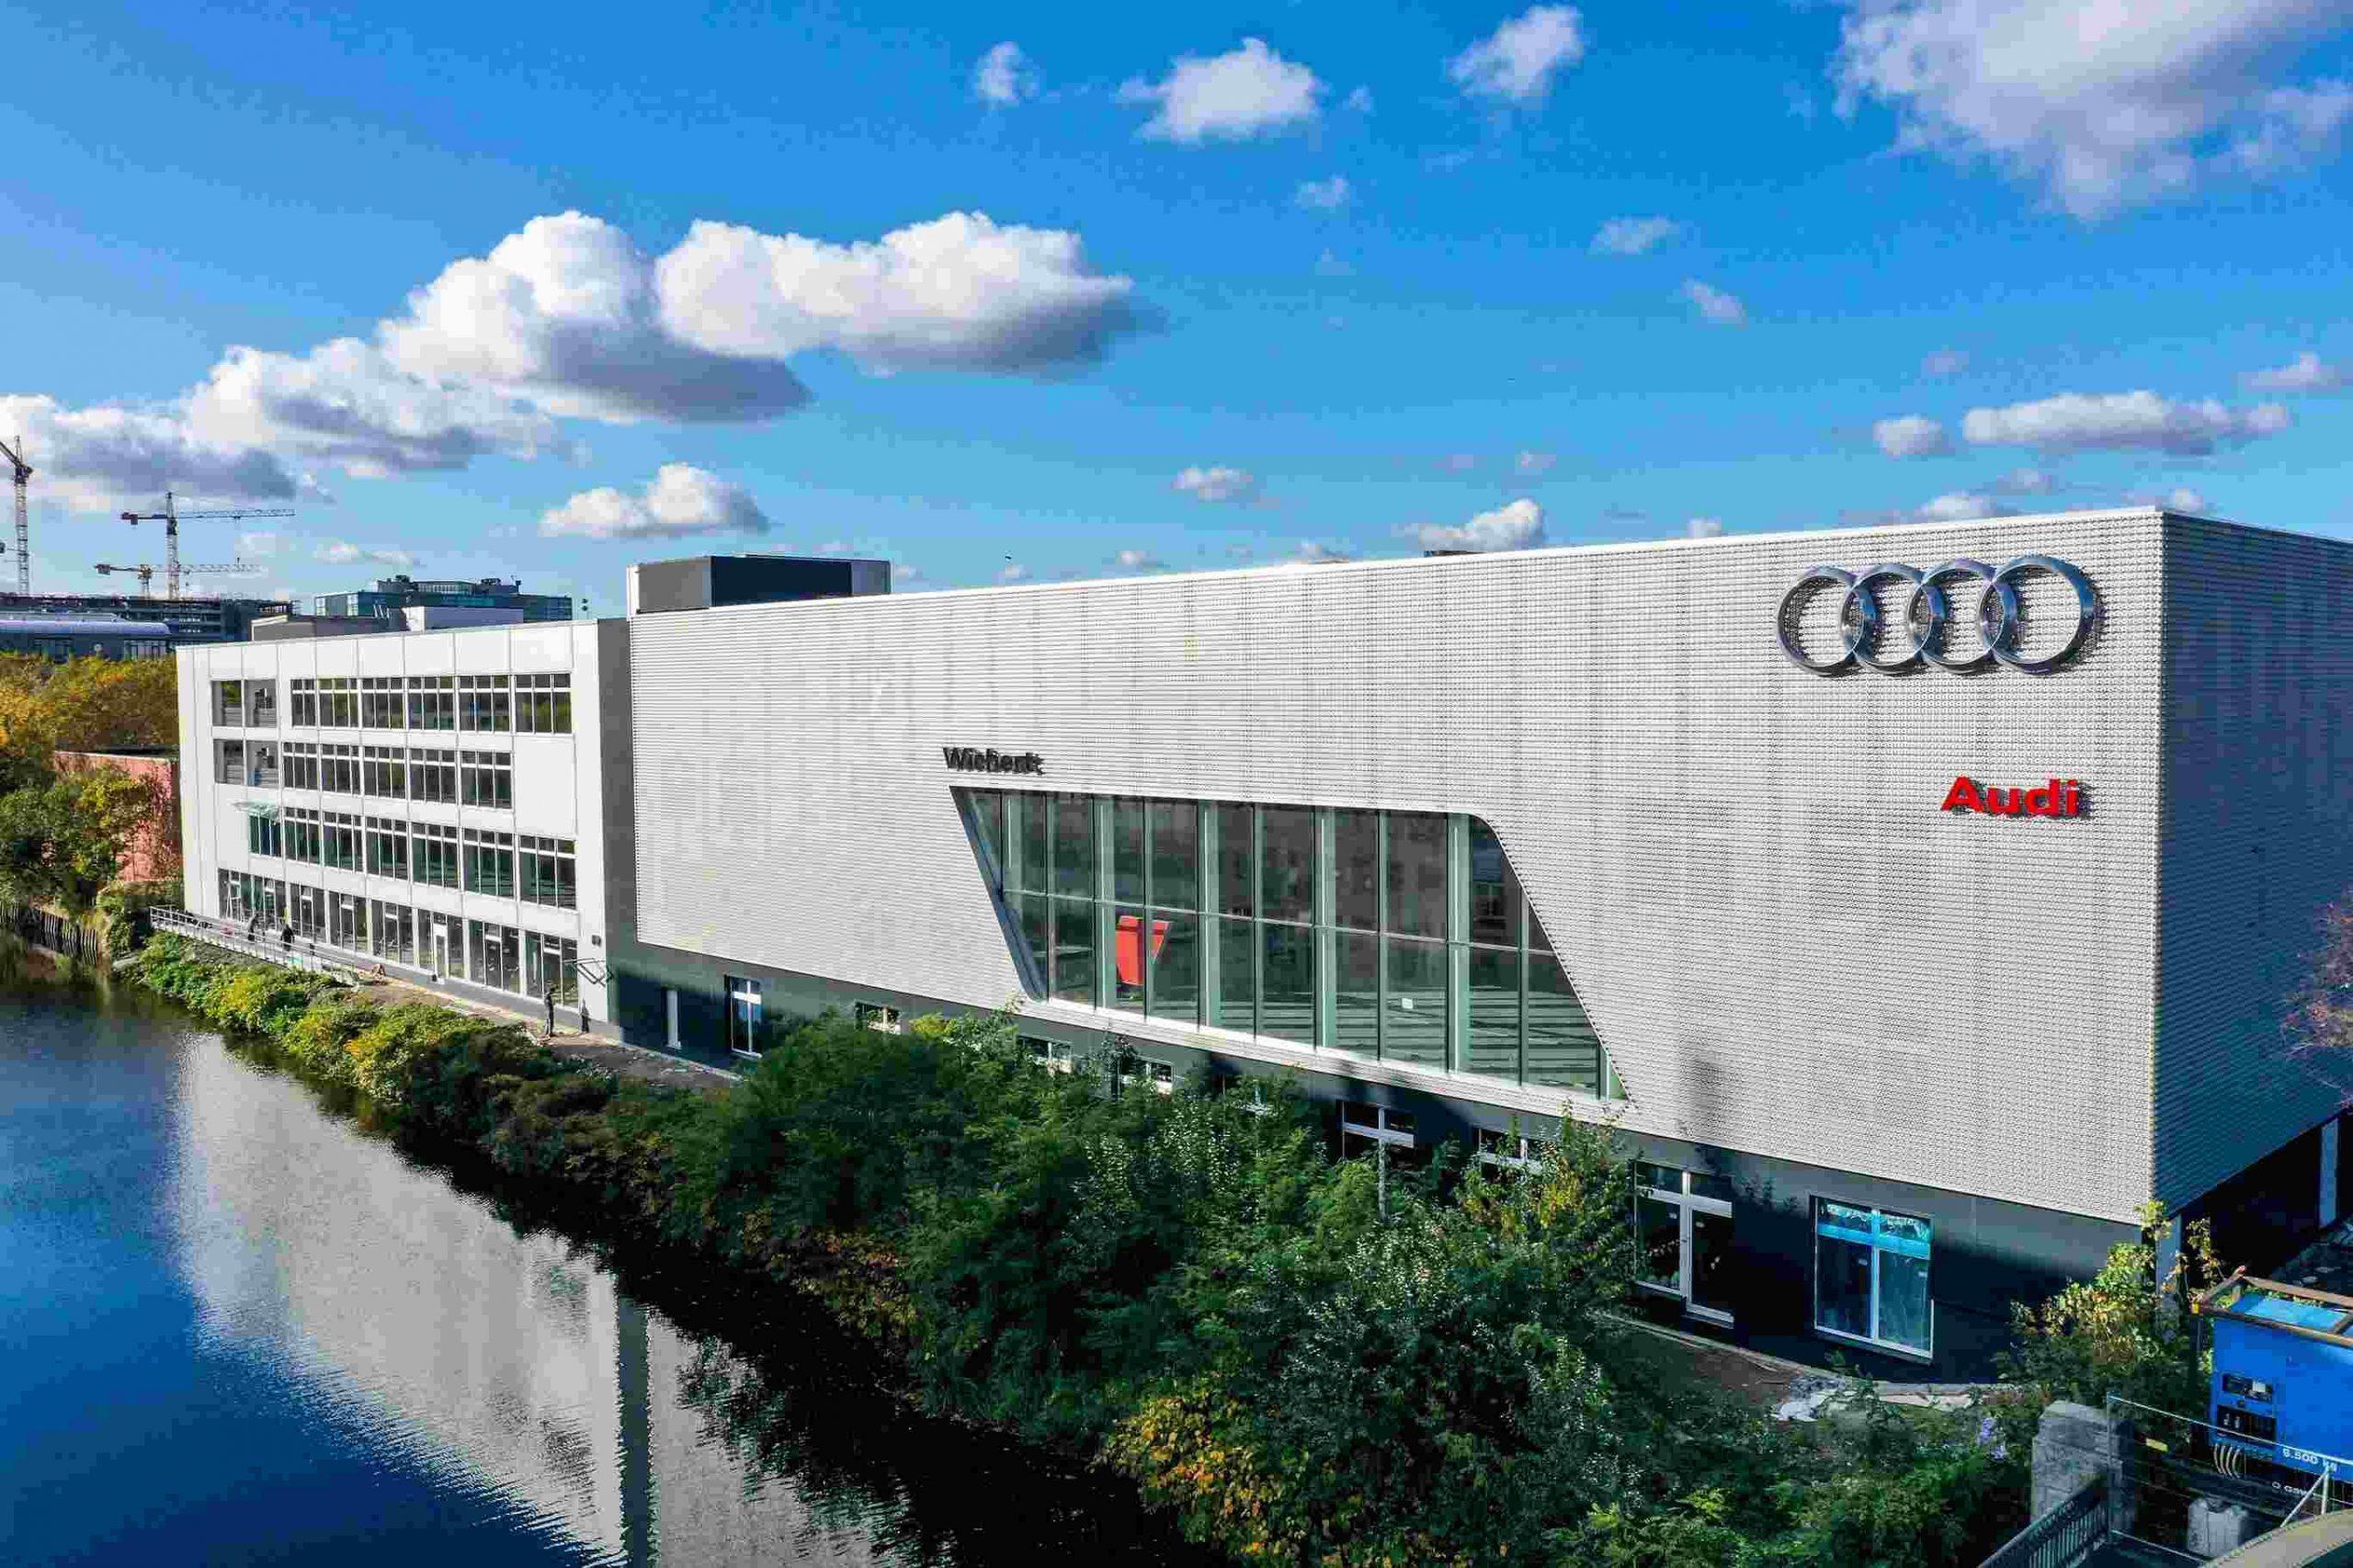 Auto Wichert Audi terminal